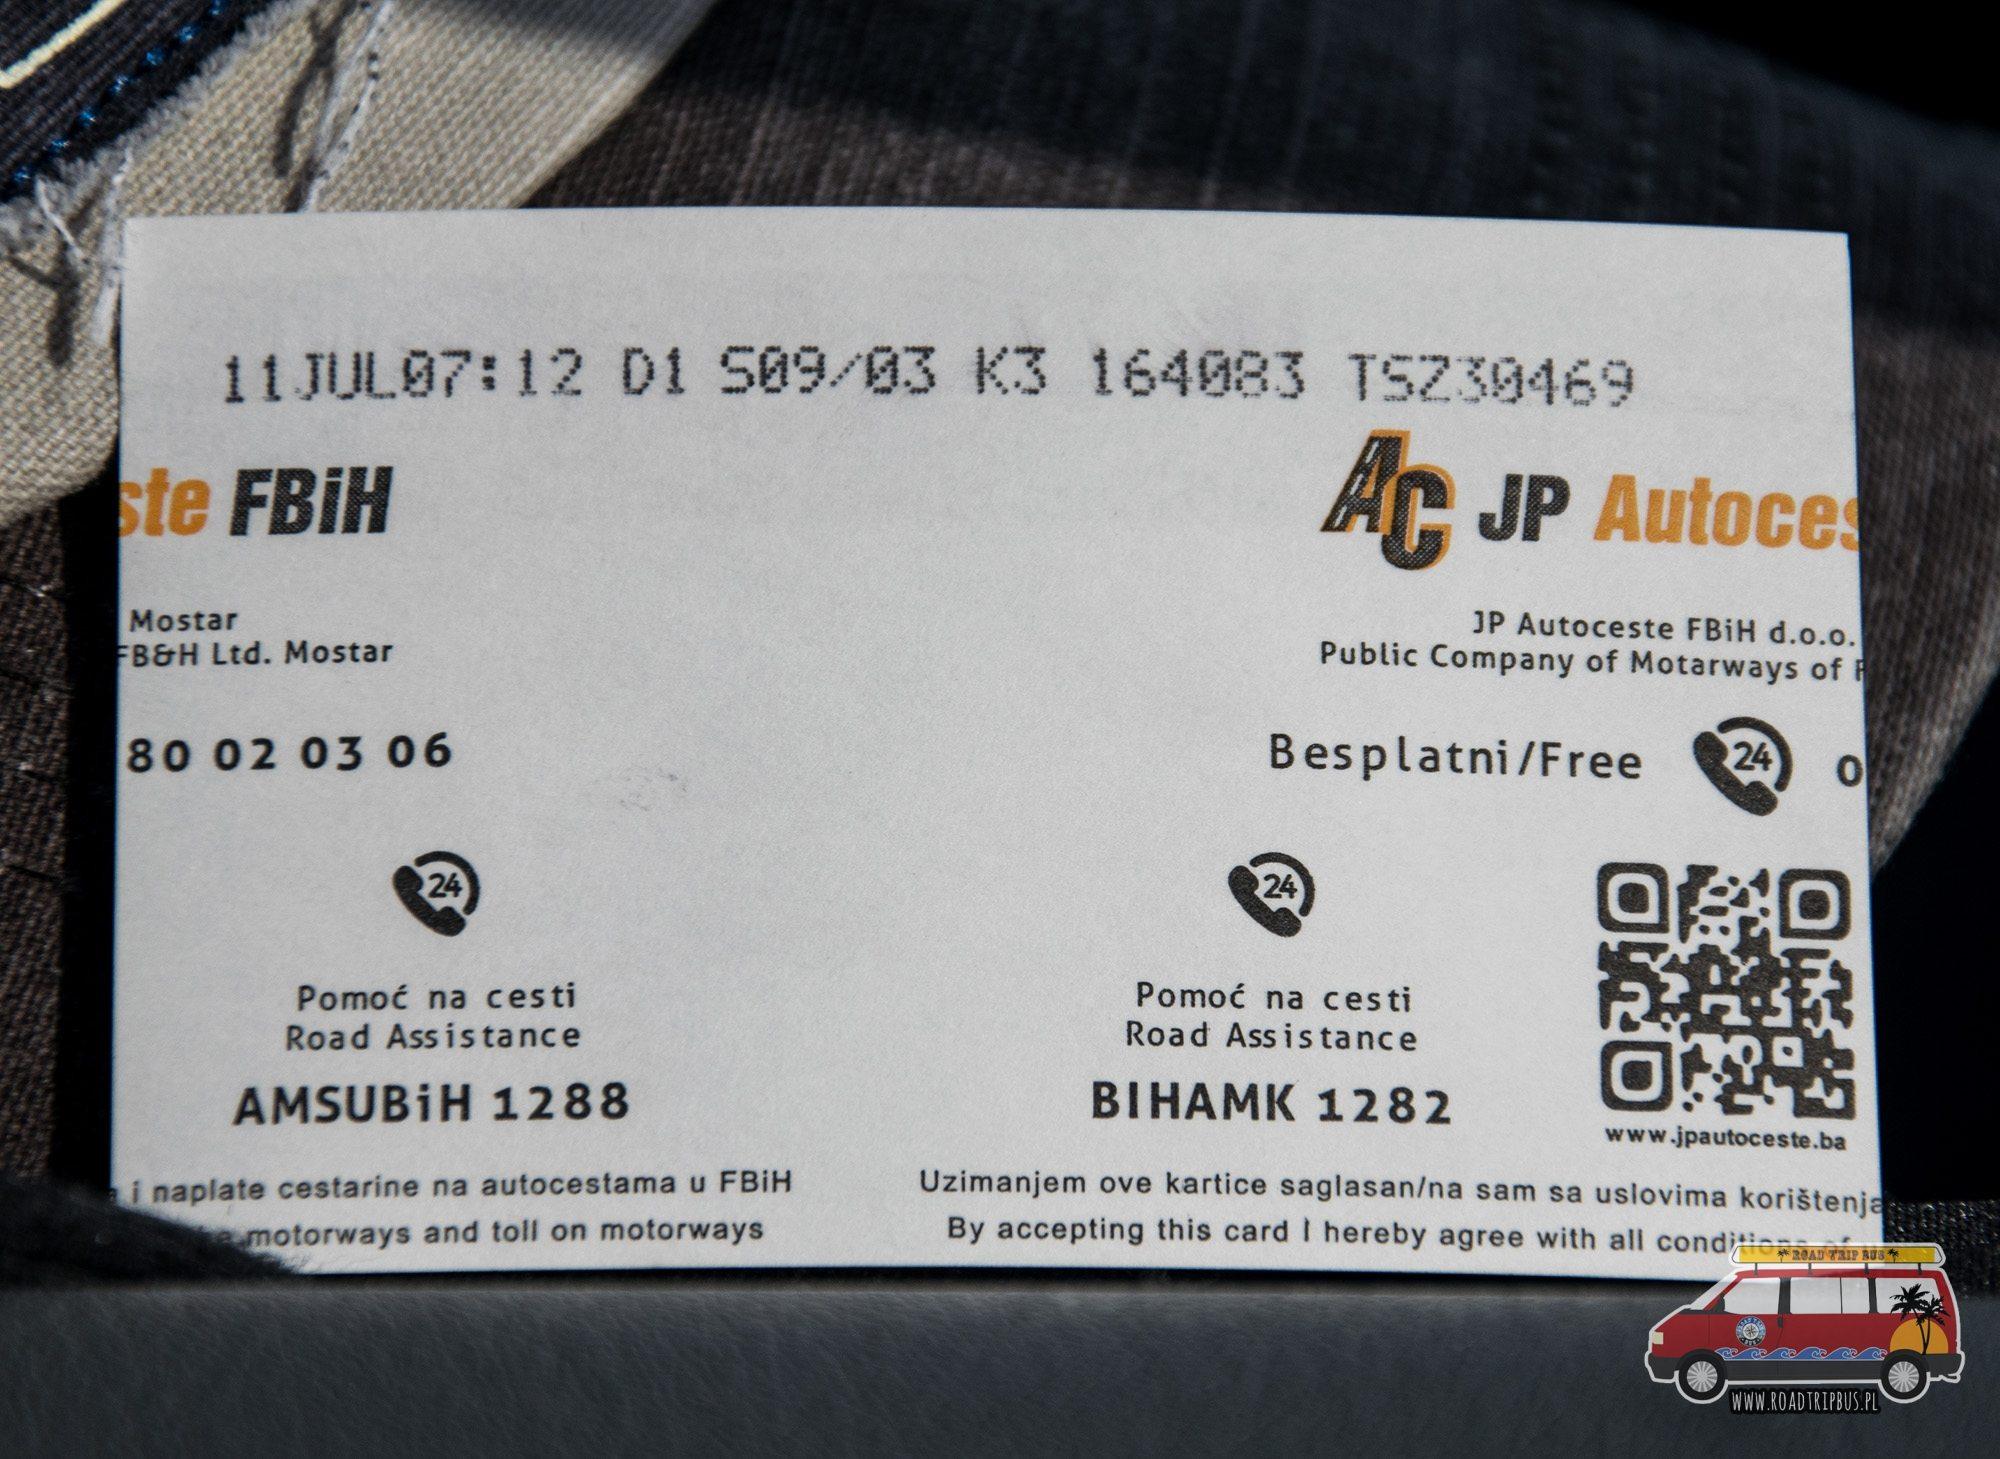 bilet autostrada Bośnia i Hercegowina